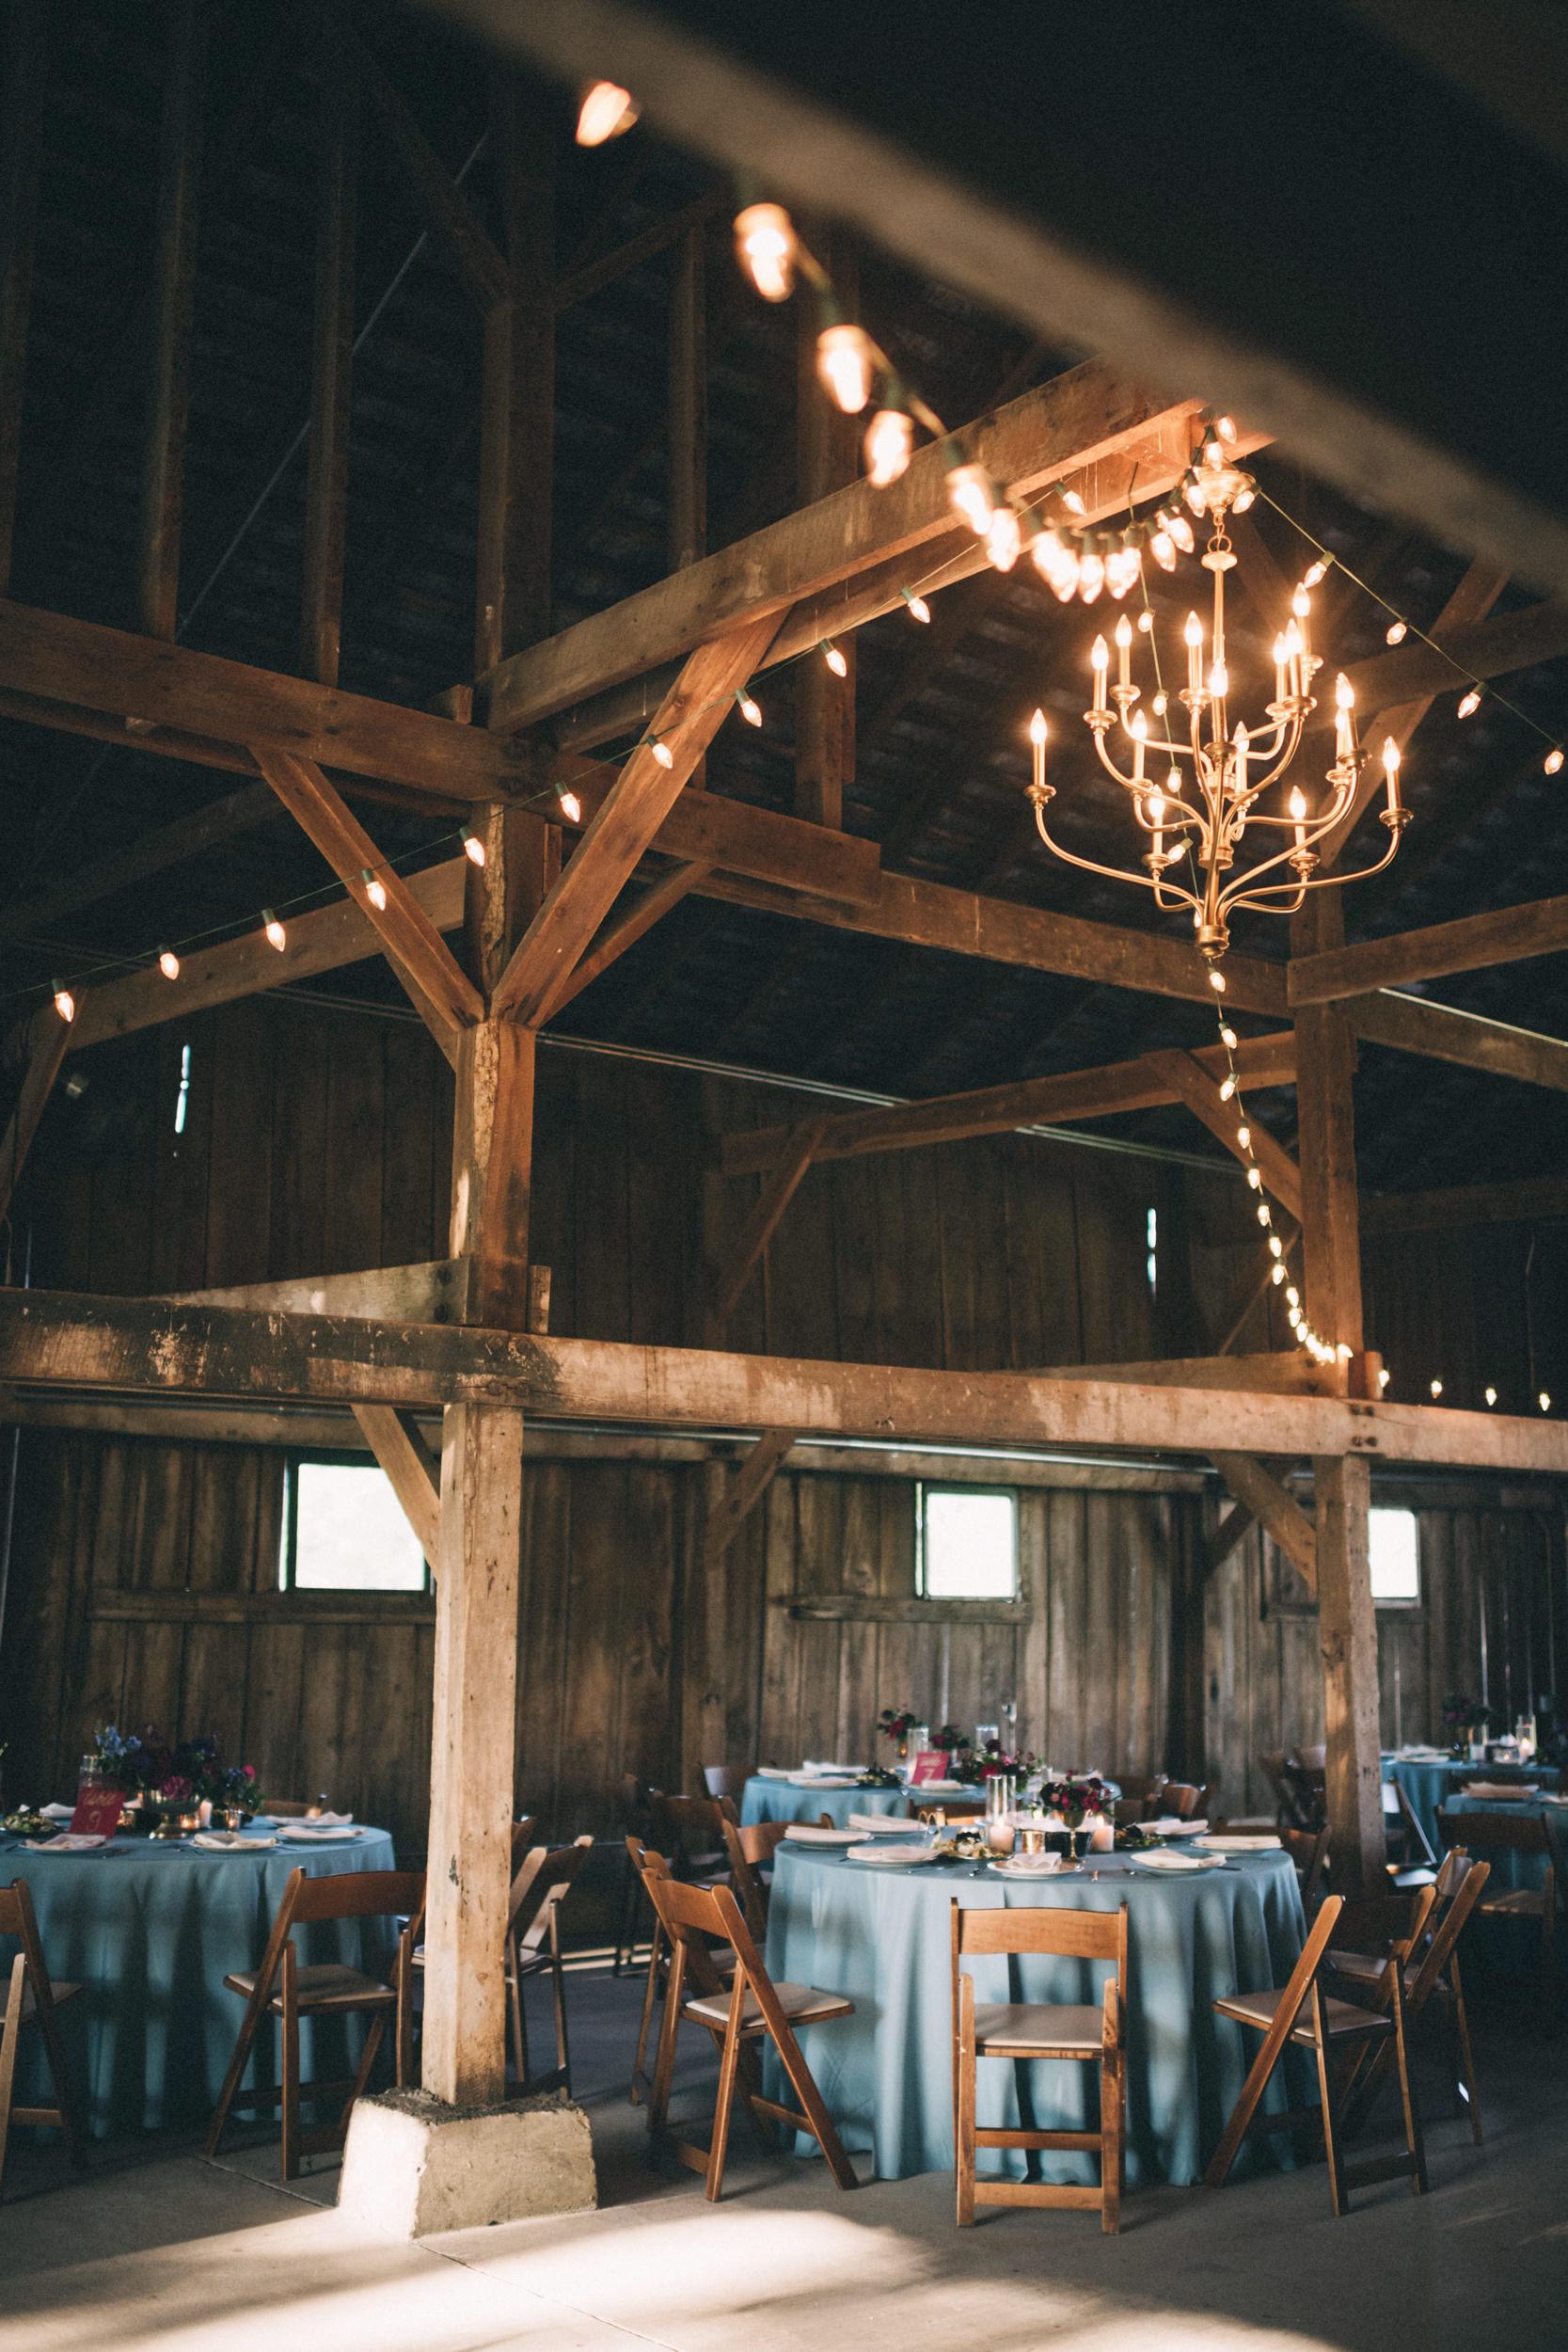 Louisville-Kentucky-Wedding-and-Elopement-Photographer-Sarah-Katherine-Davis-Photography-Summer-Jewel-Toned-Wedding-Chineese-Tea-Ceremony-Warrenwood-Manor-Danville-665.jpg